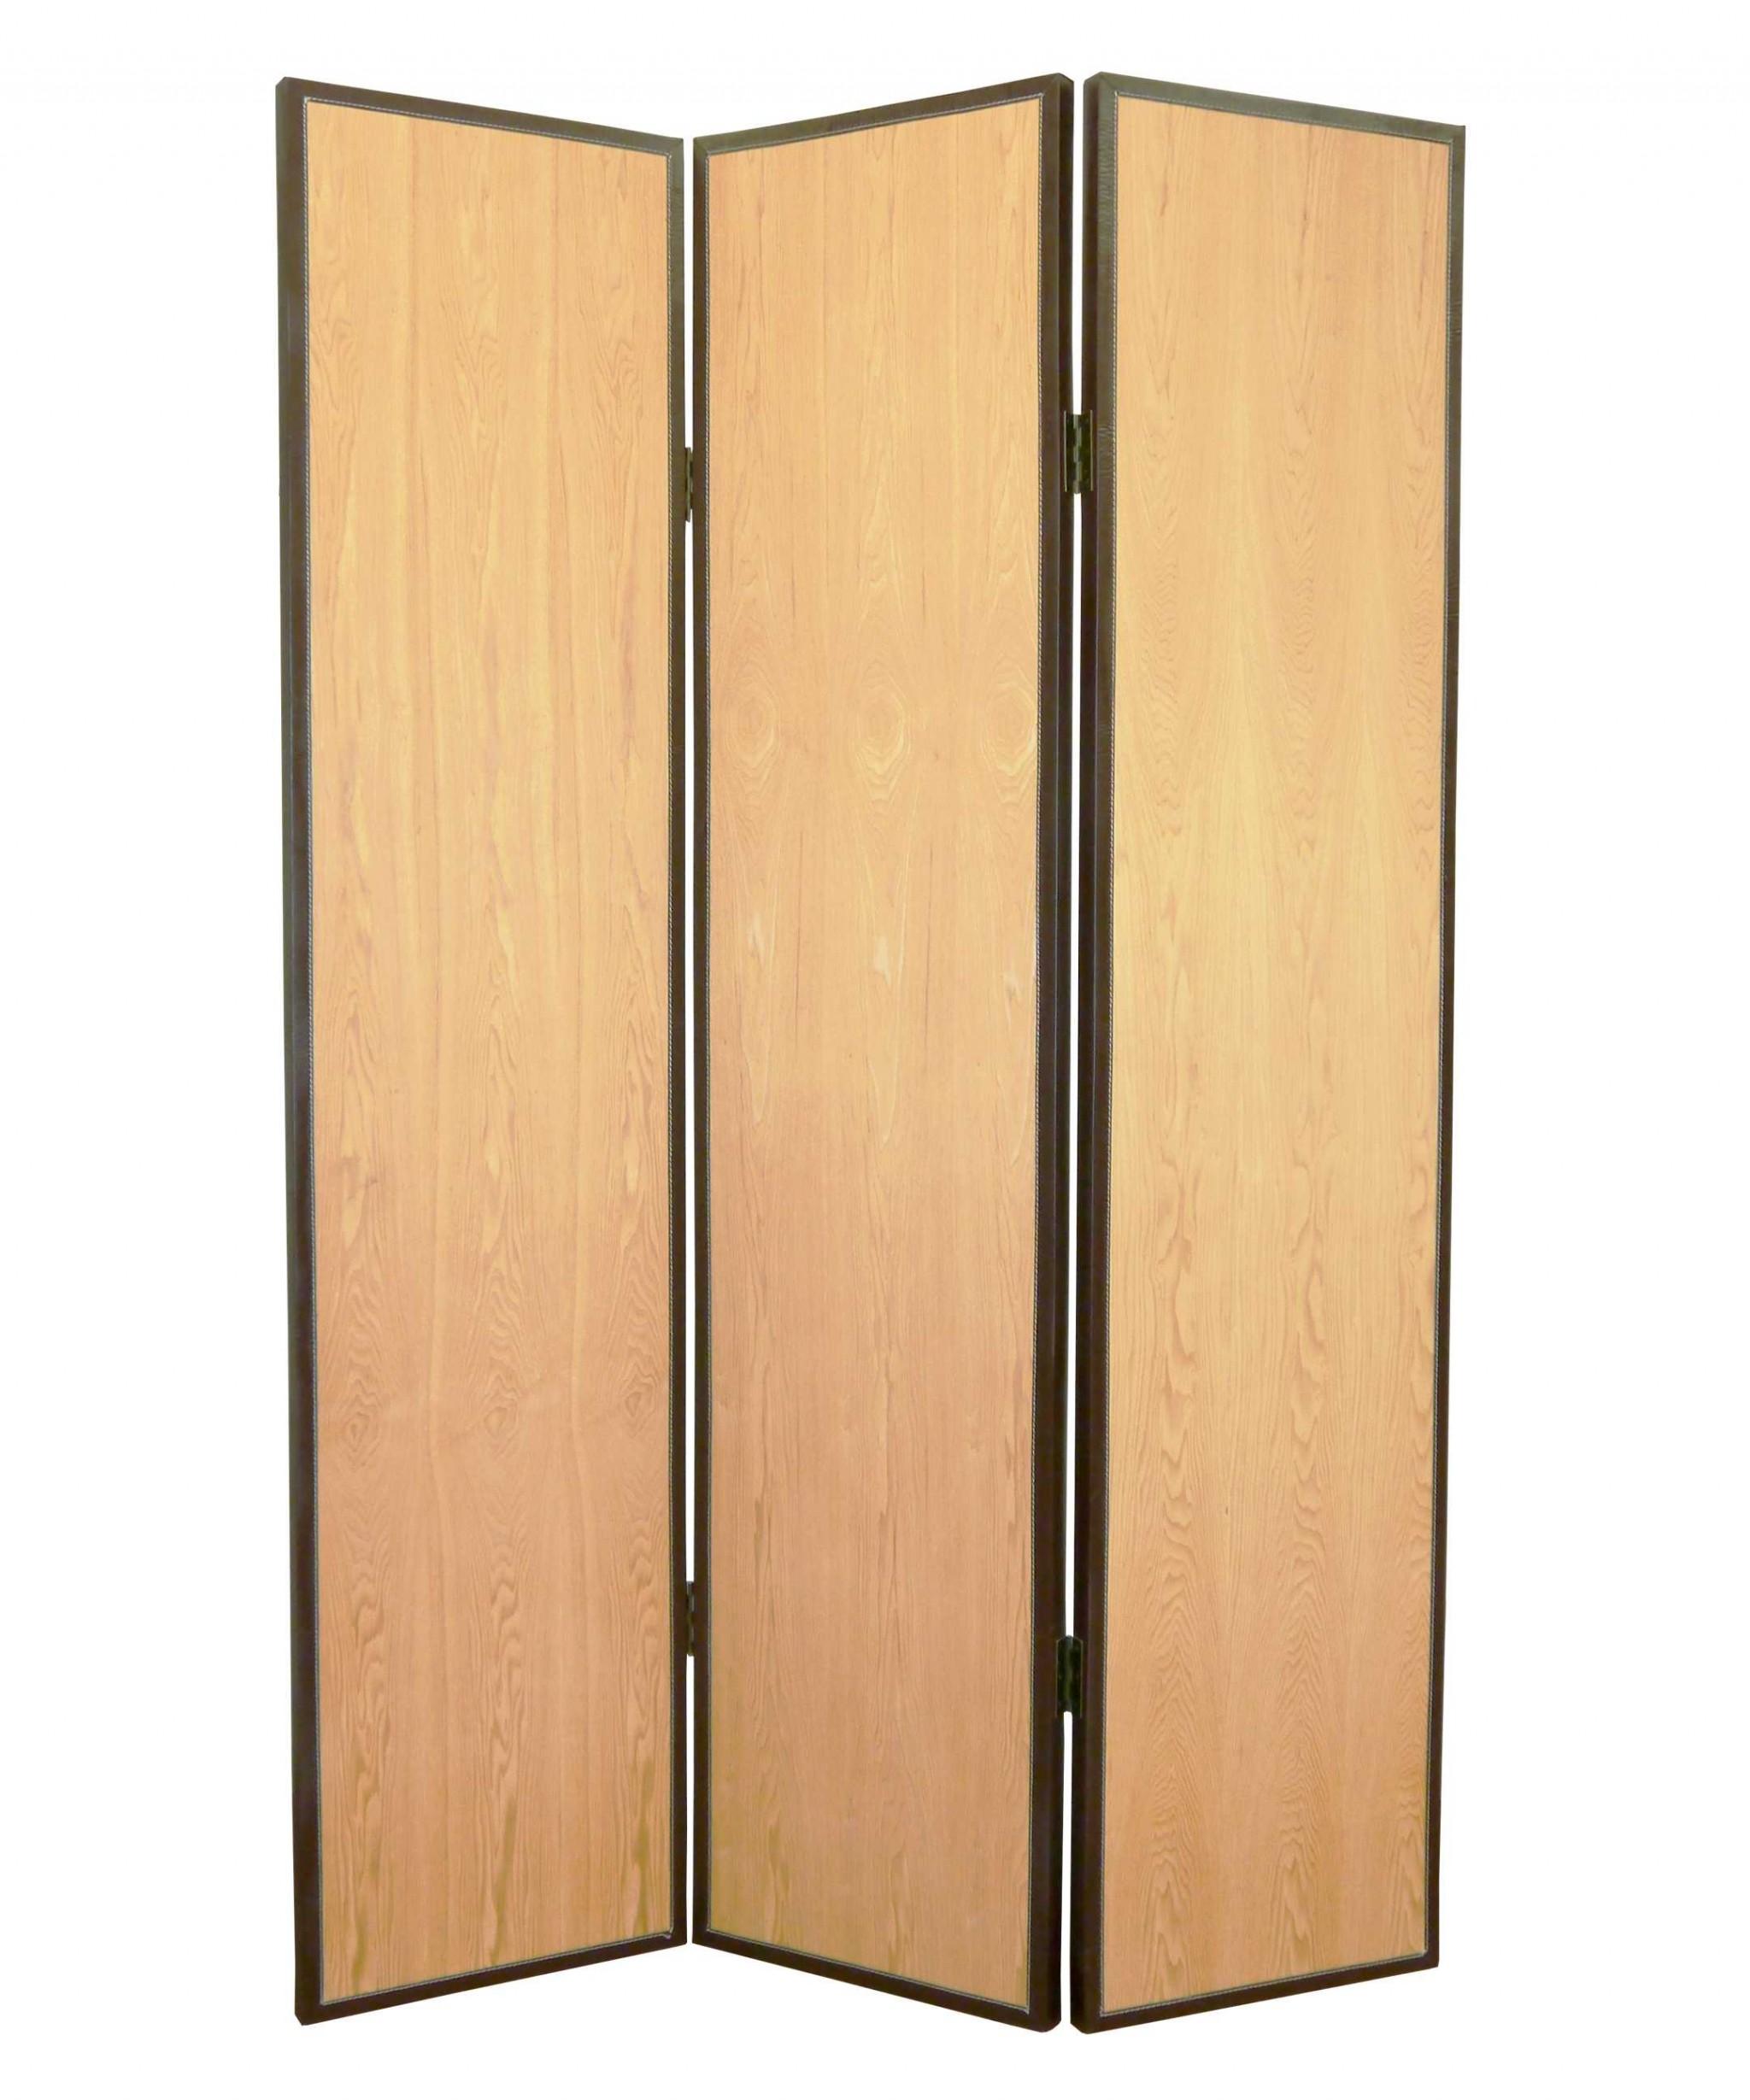 "1"" x 47"" x 71"" Natural Wood  Screen"